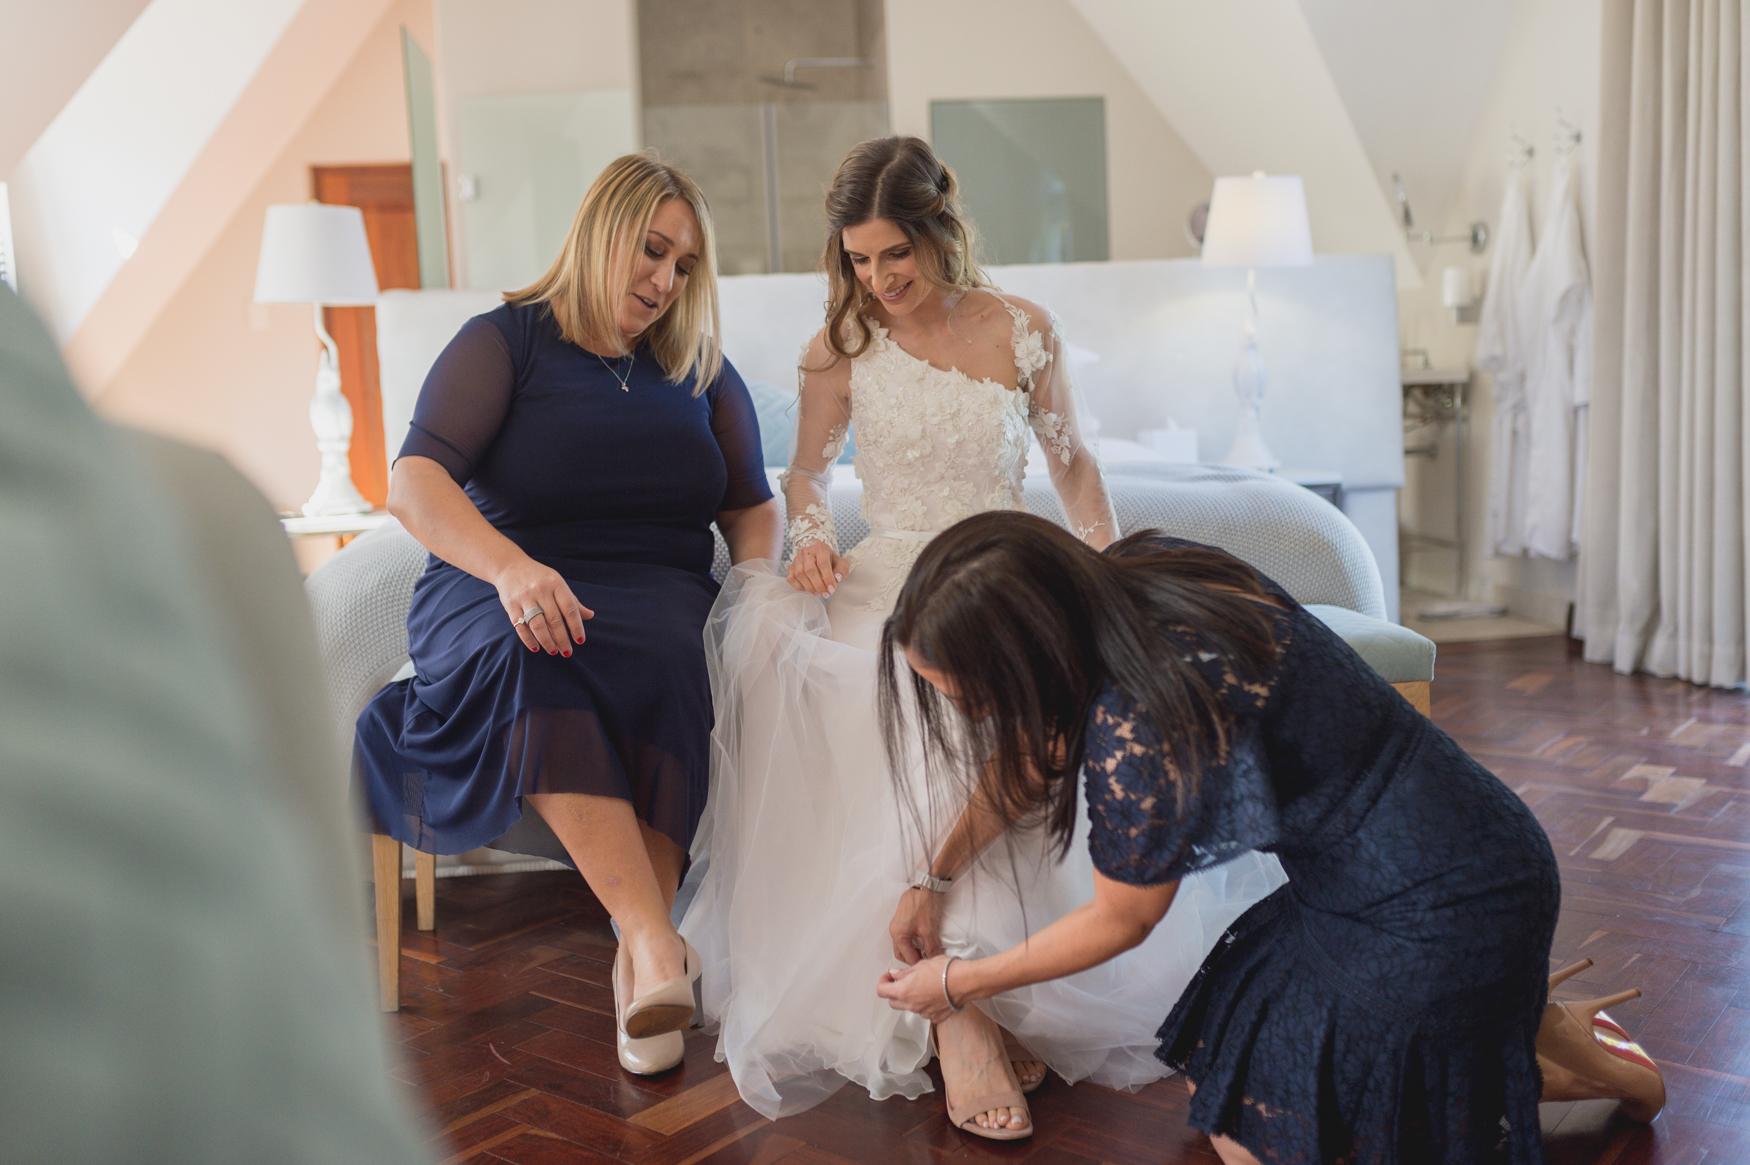 Leon_&_Martine's_Wedding_Photographs_17th_April_2019_@johnhenryweddingphoto_Low_Resolution_Web-113.JPG